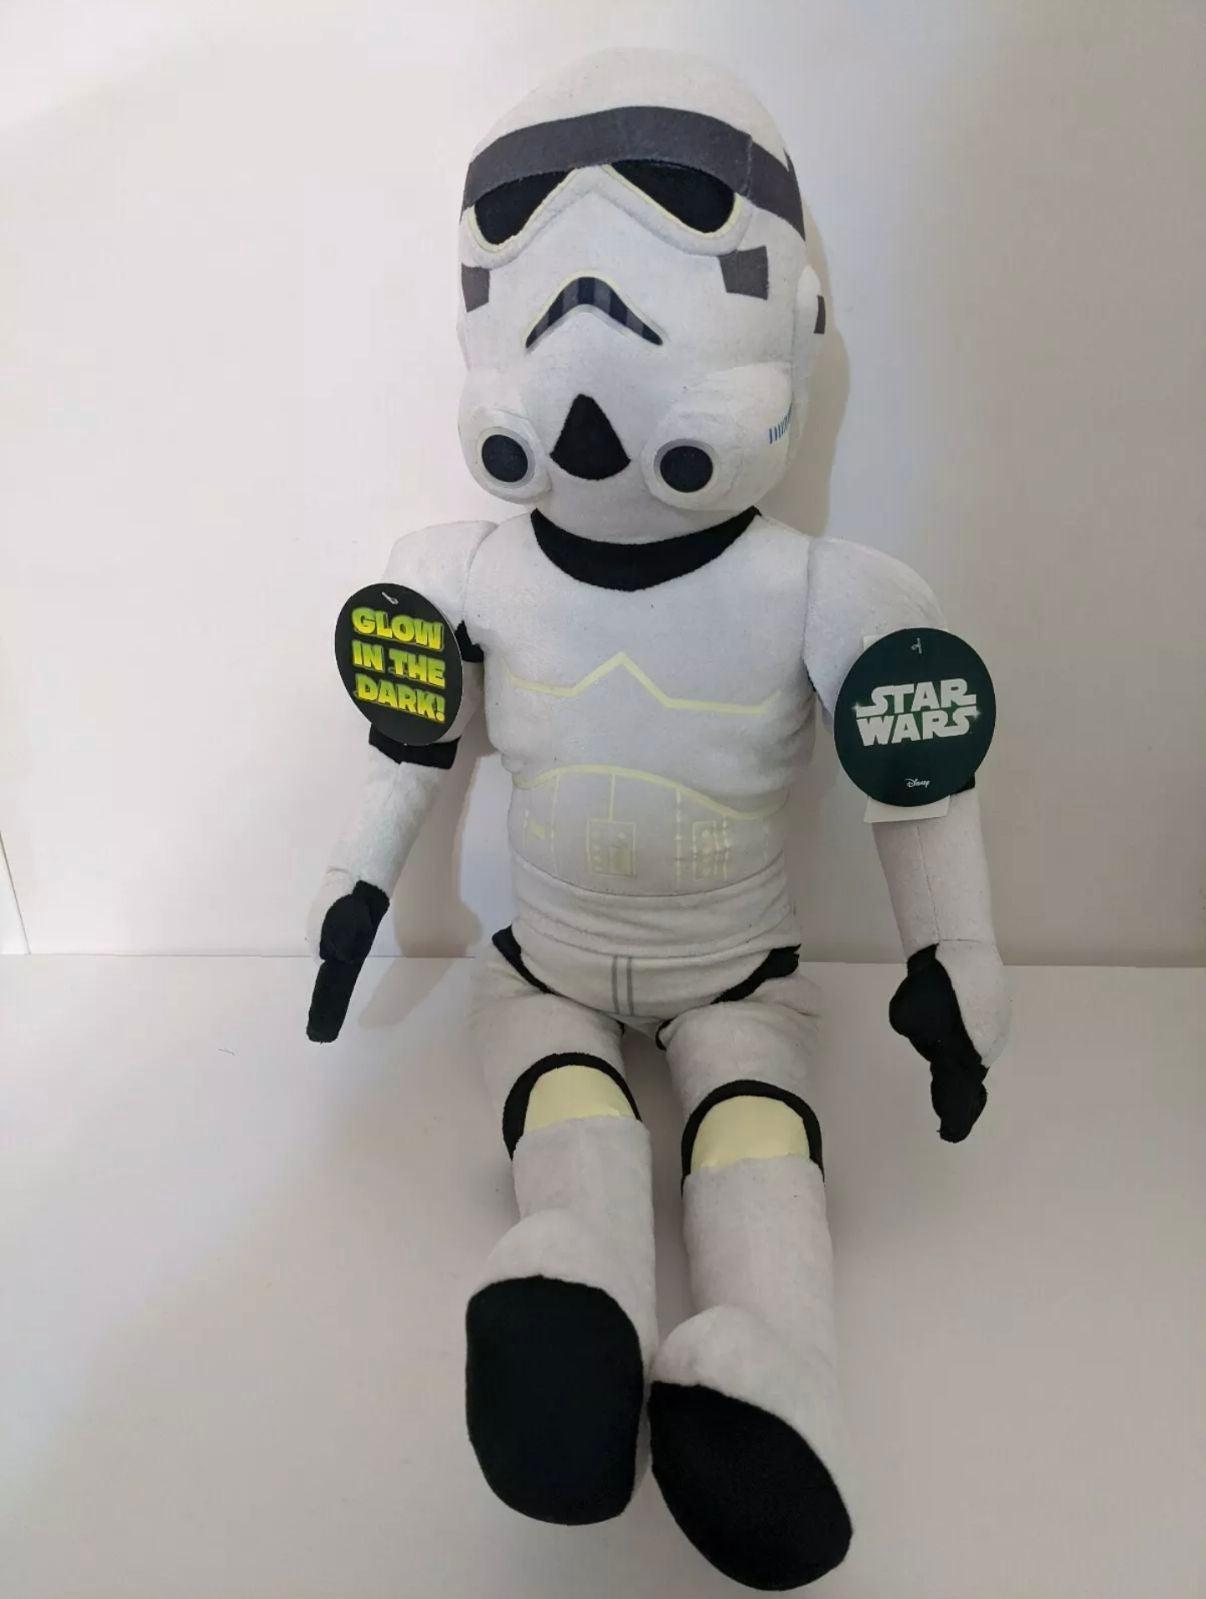 Star Wars Stormtrooper Disney